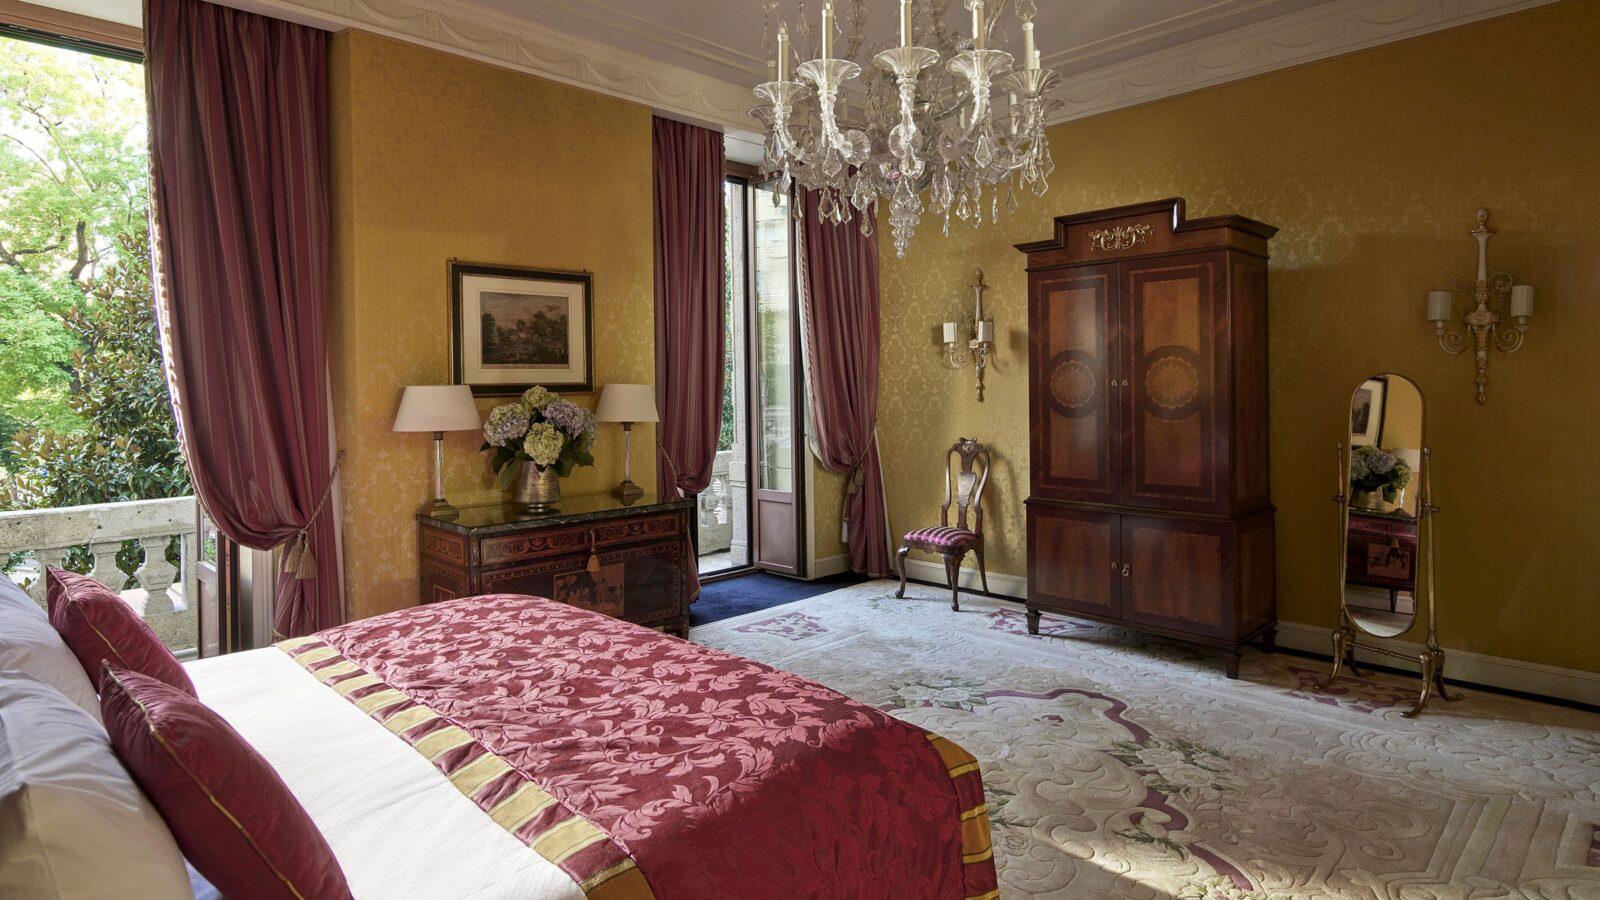 Principe SUite, Hotel Principe di Savoia, Milan